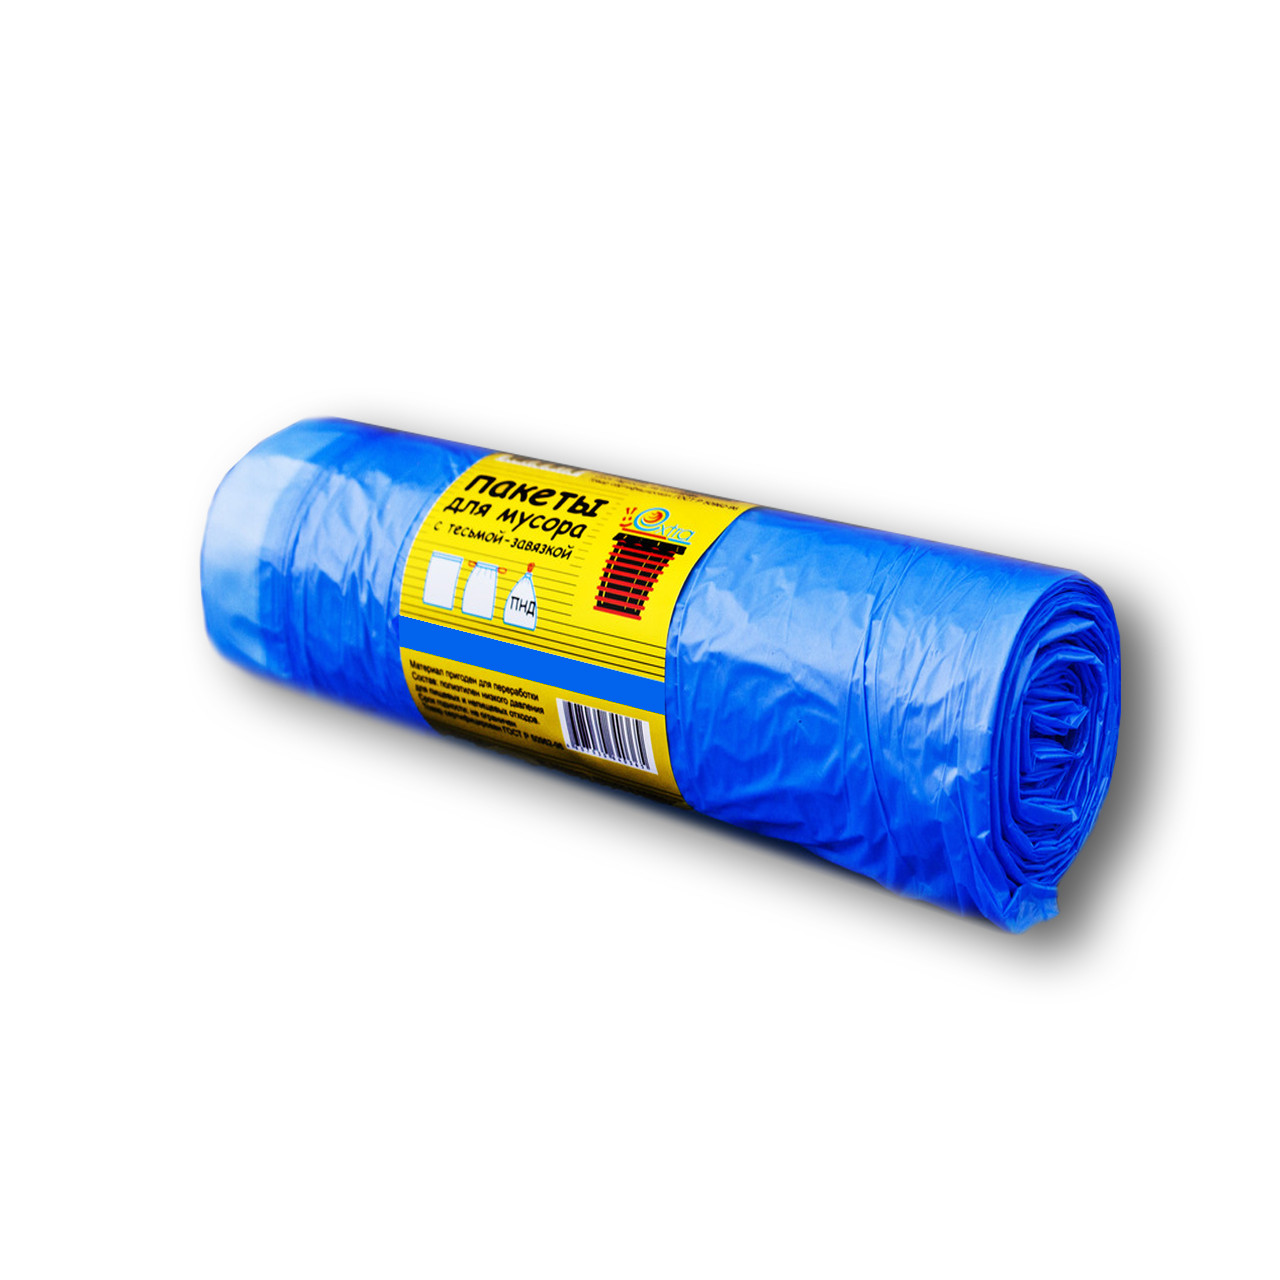 Пакет для мусора ПНД с завязками 60*80, 60л EXTRA (30шт в рулоне)